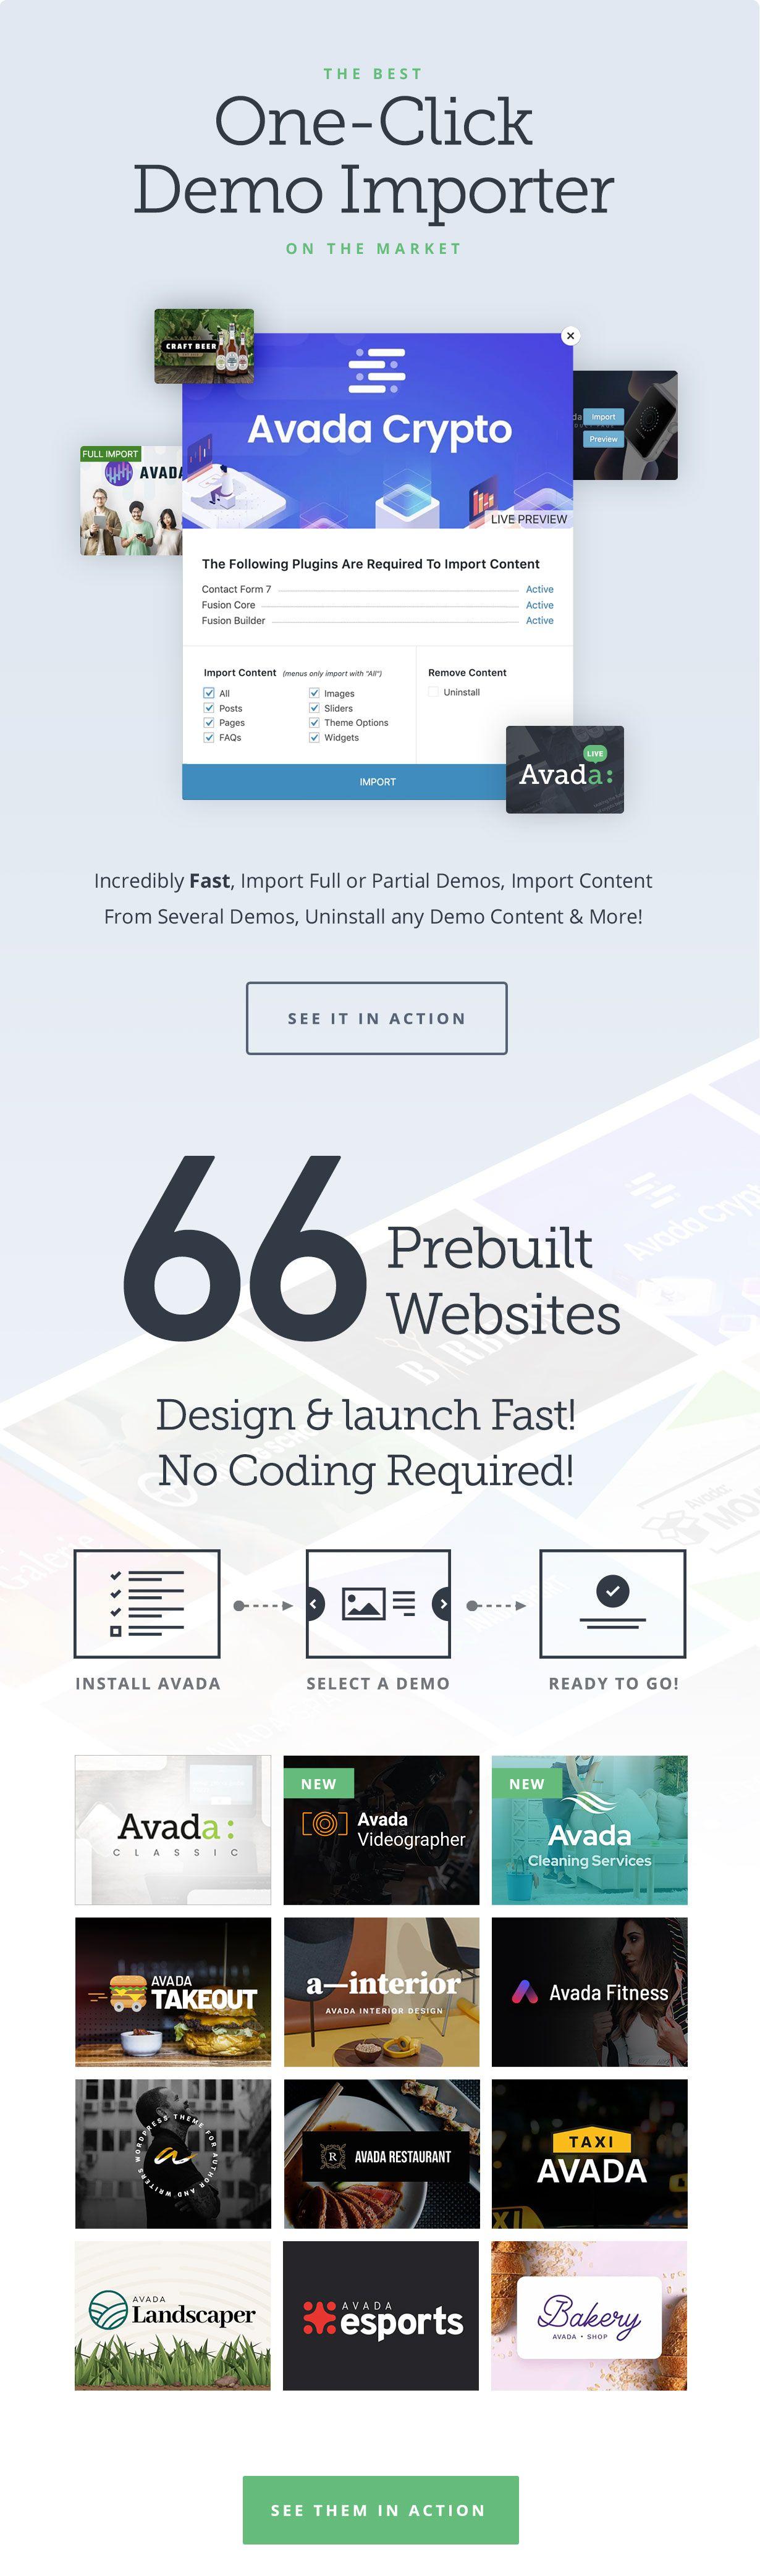 foto de Avada | Website Builder For WordPress & WooCommerce by ThemeFusion